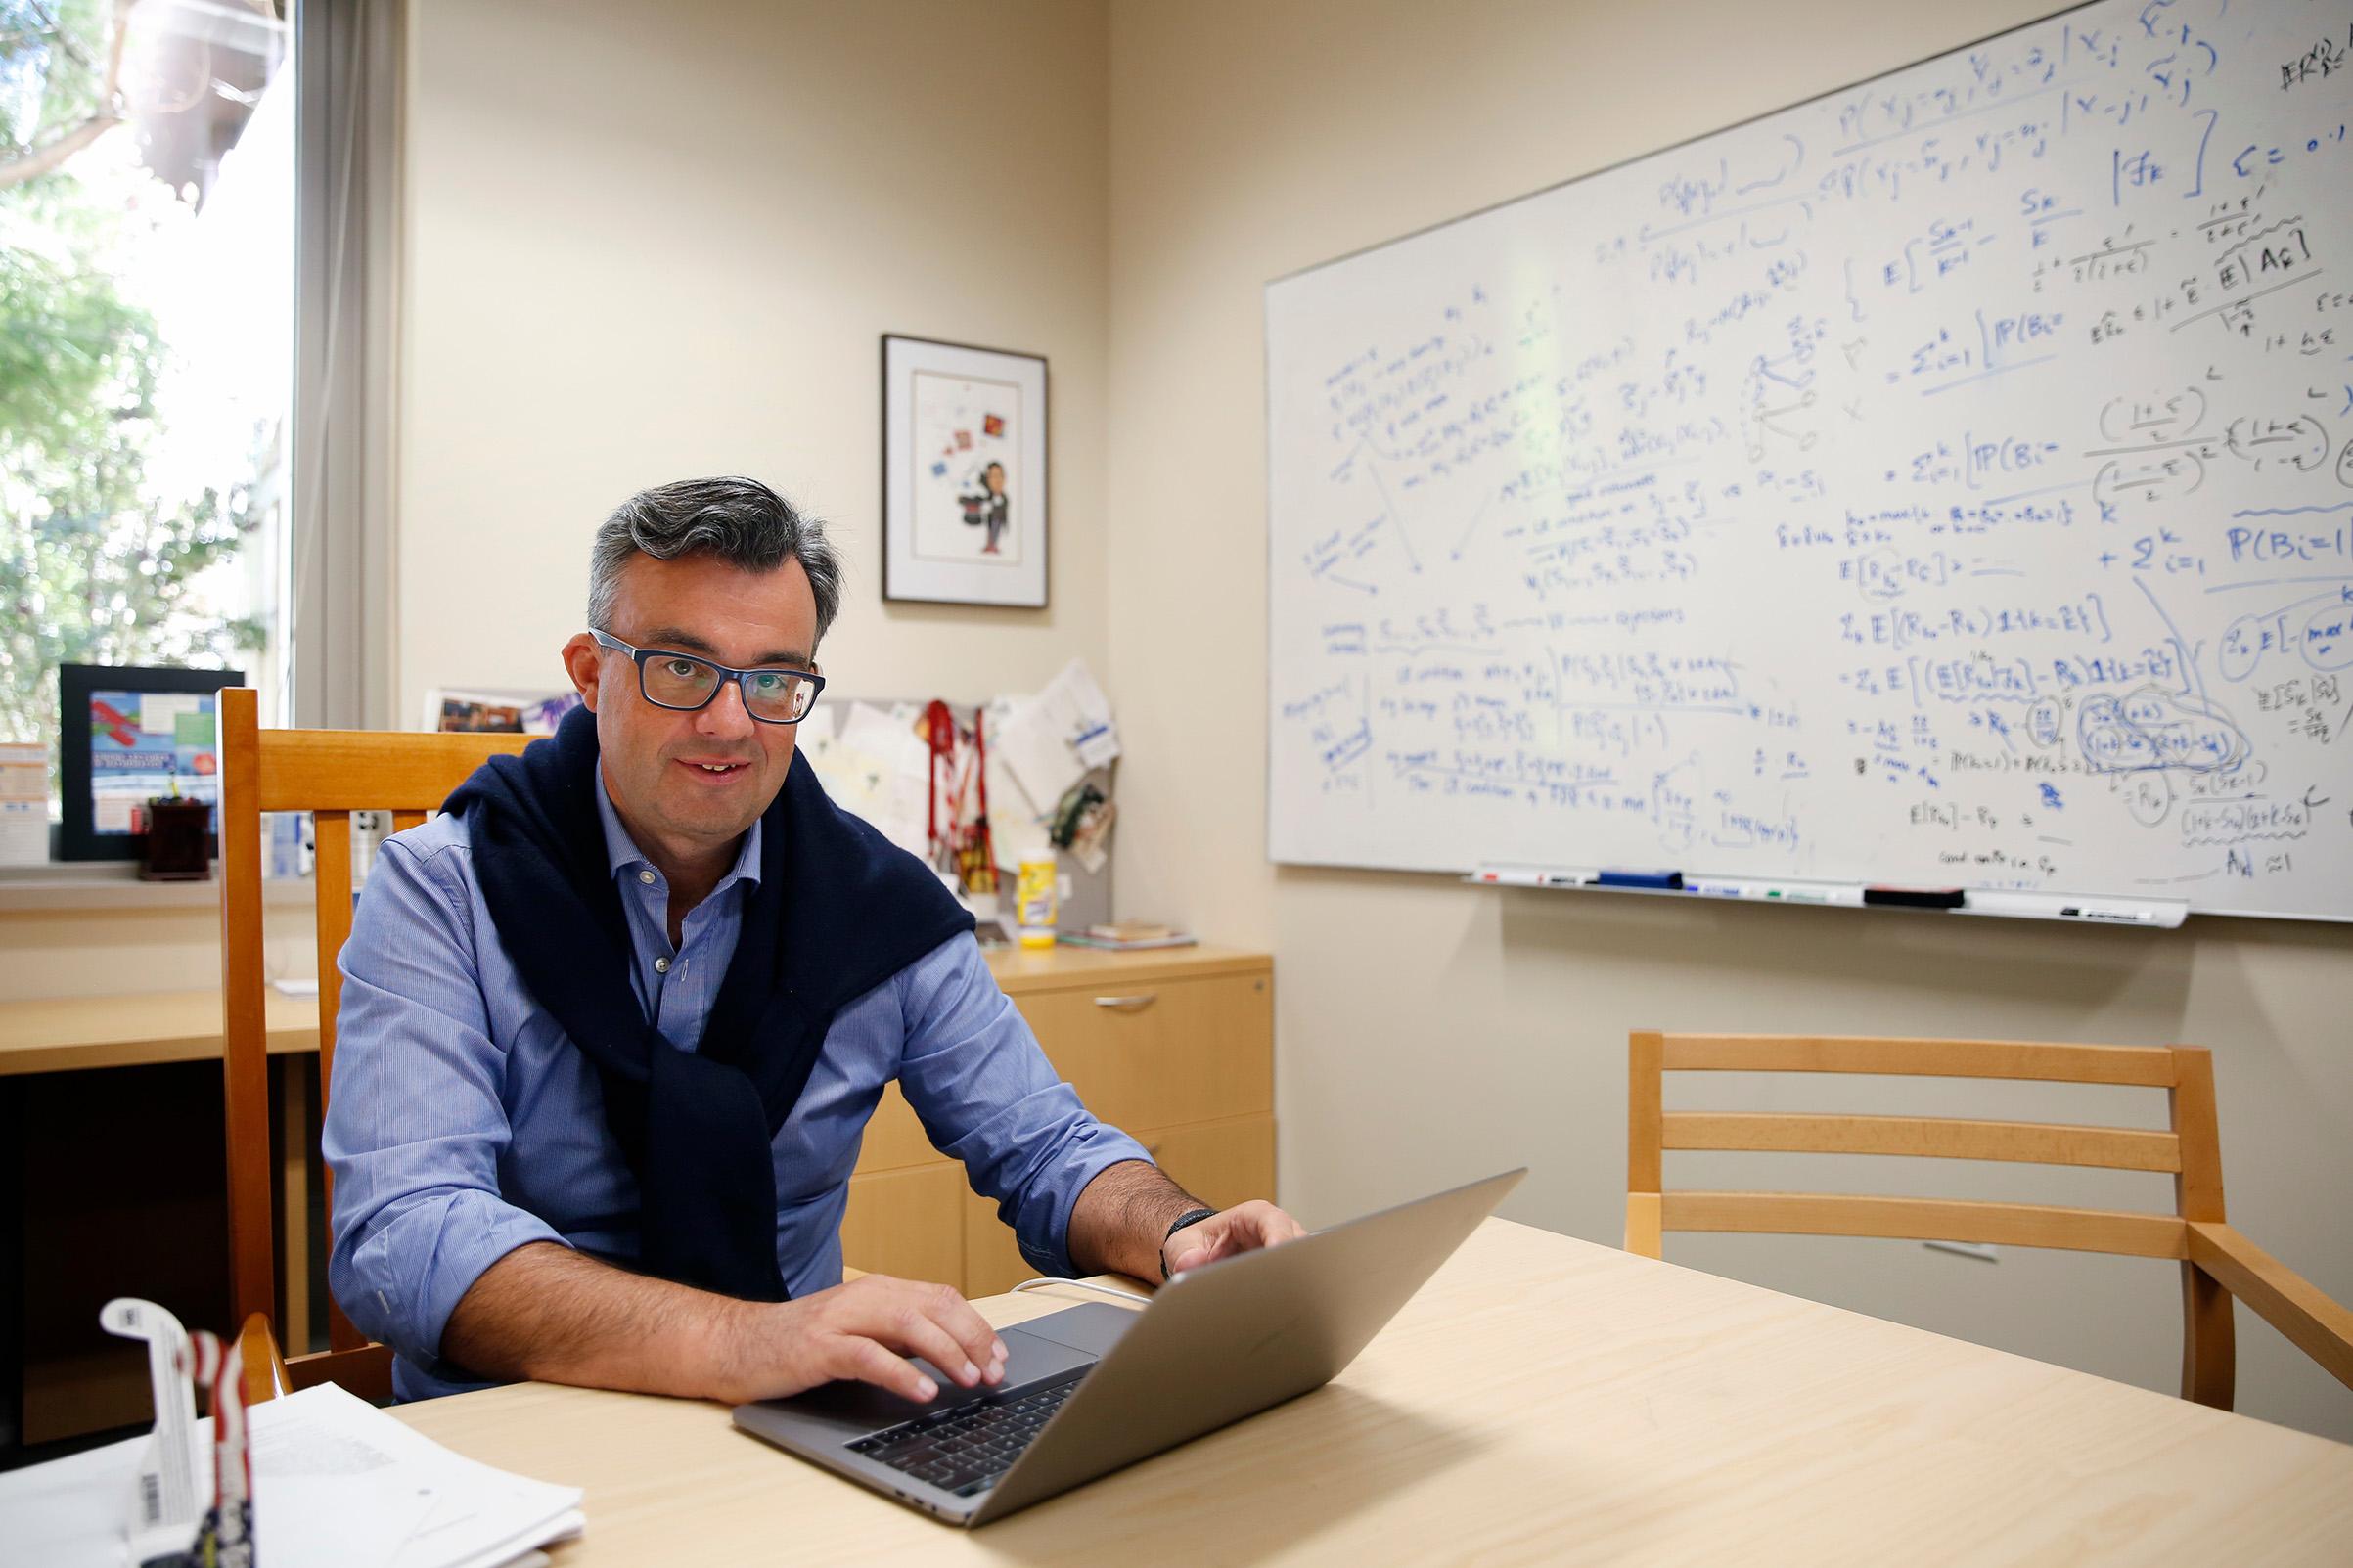 Emmanuel Candes, 2017 MacArthur Fellow, Stanford University, Palo Alto, CA, on Sept. 22, 2017.